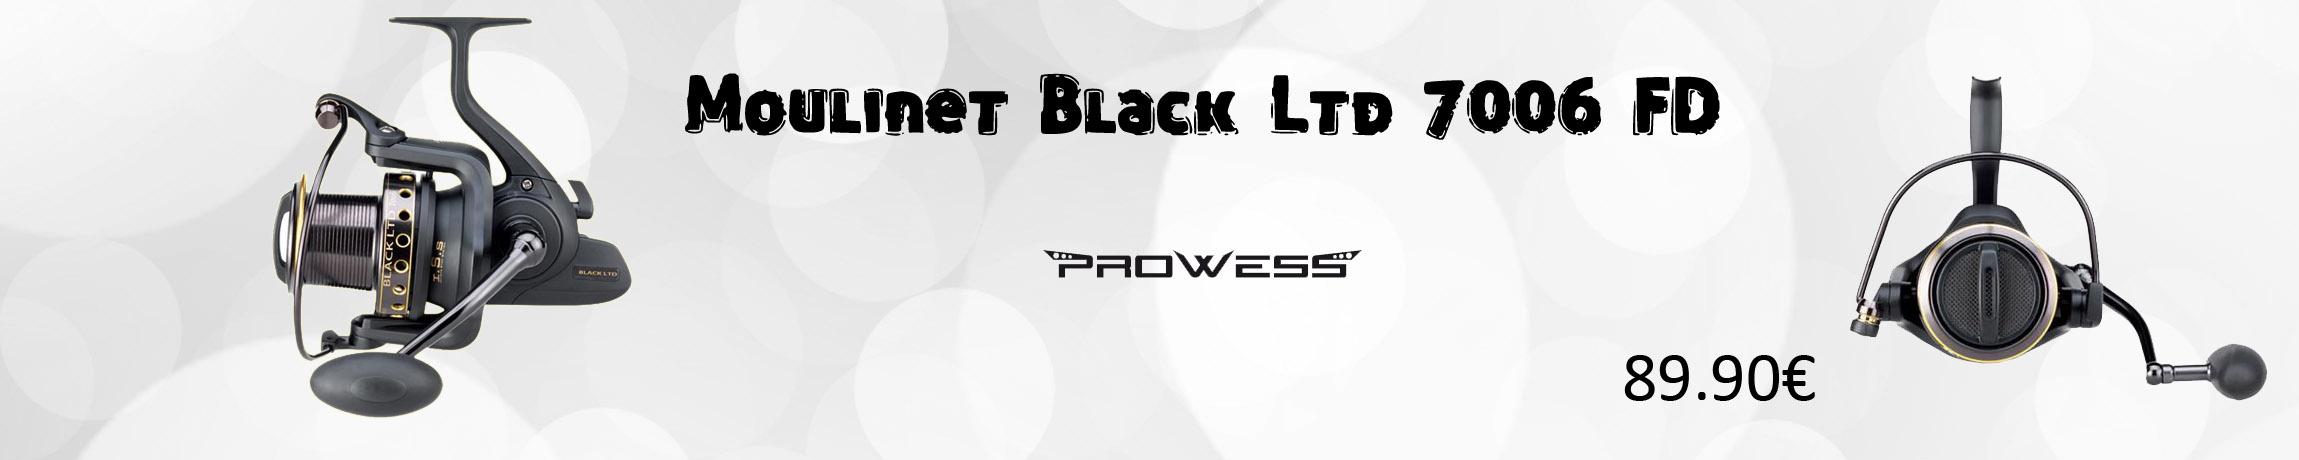 black_ltd